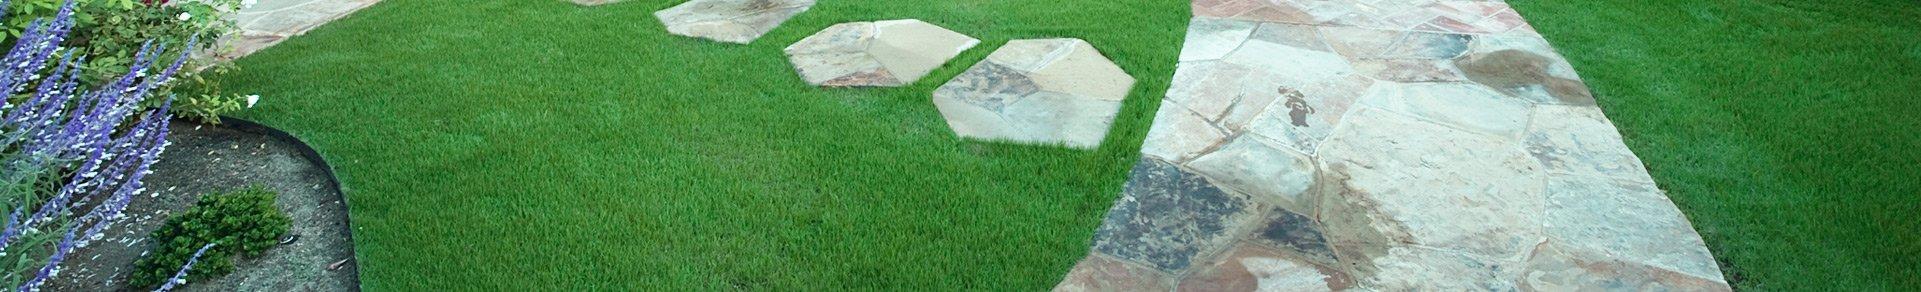 turf with slate pathway